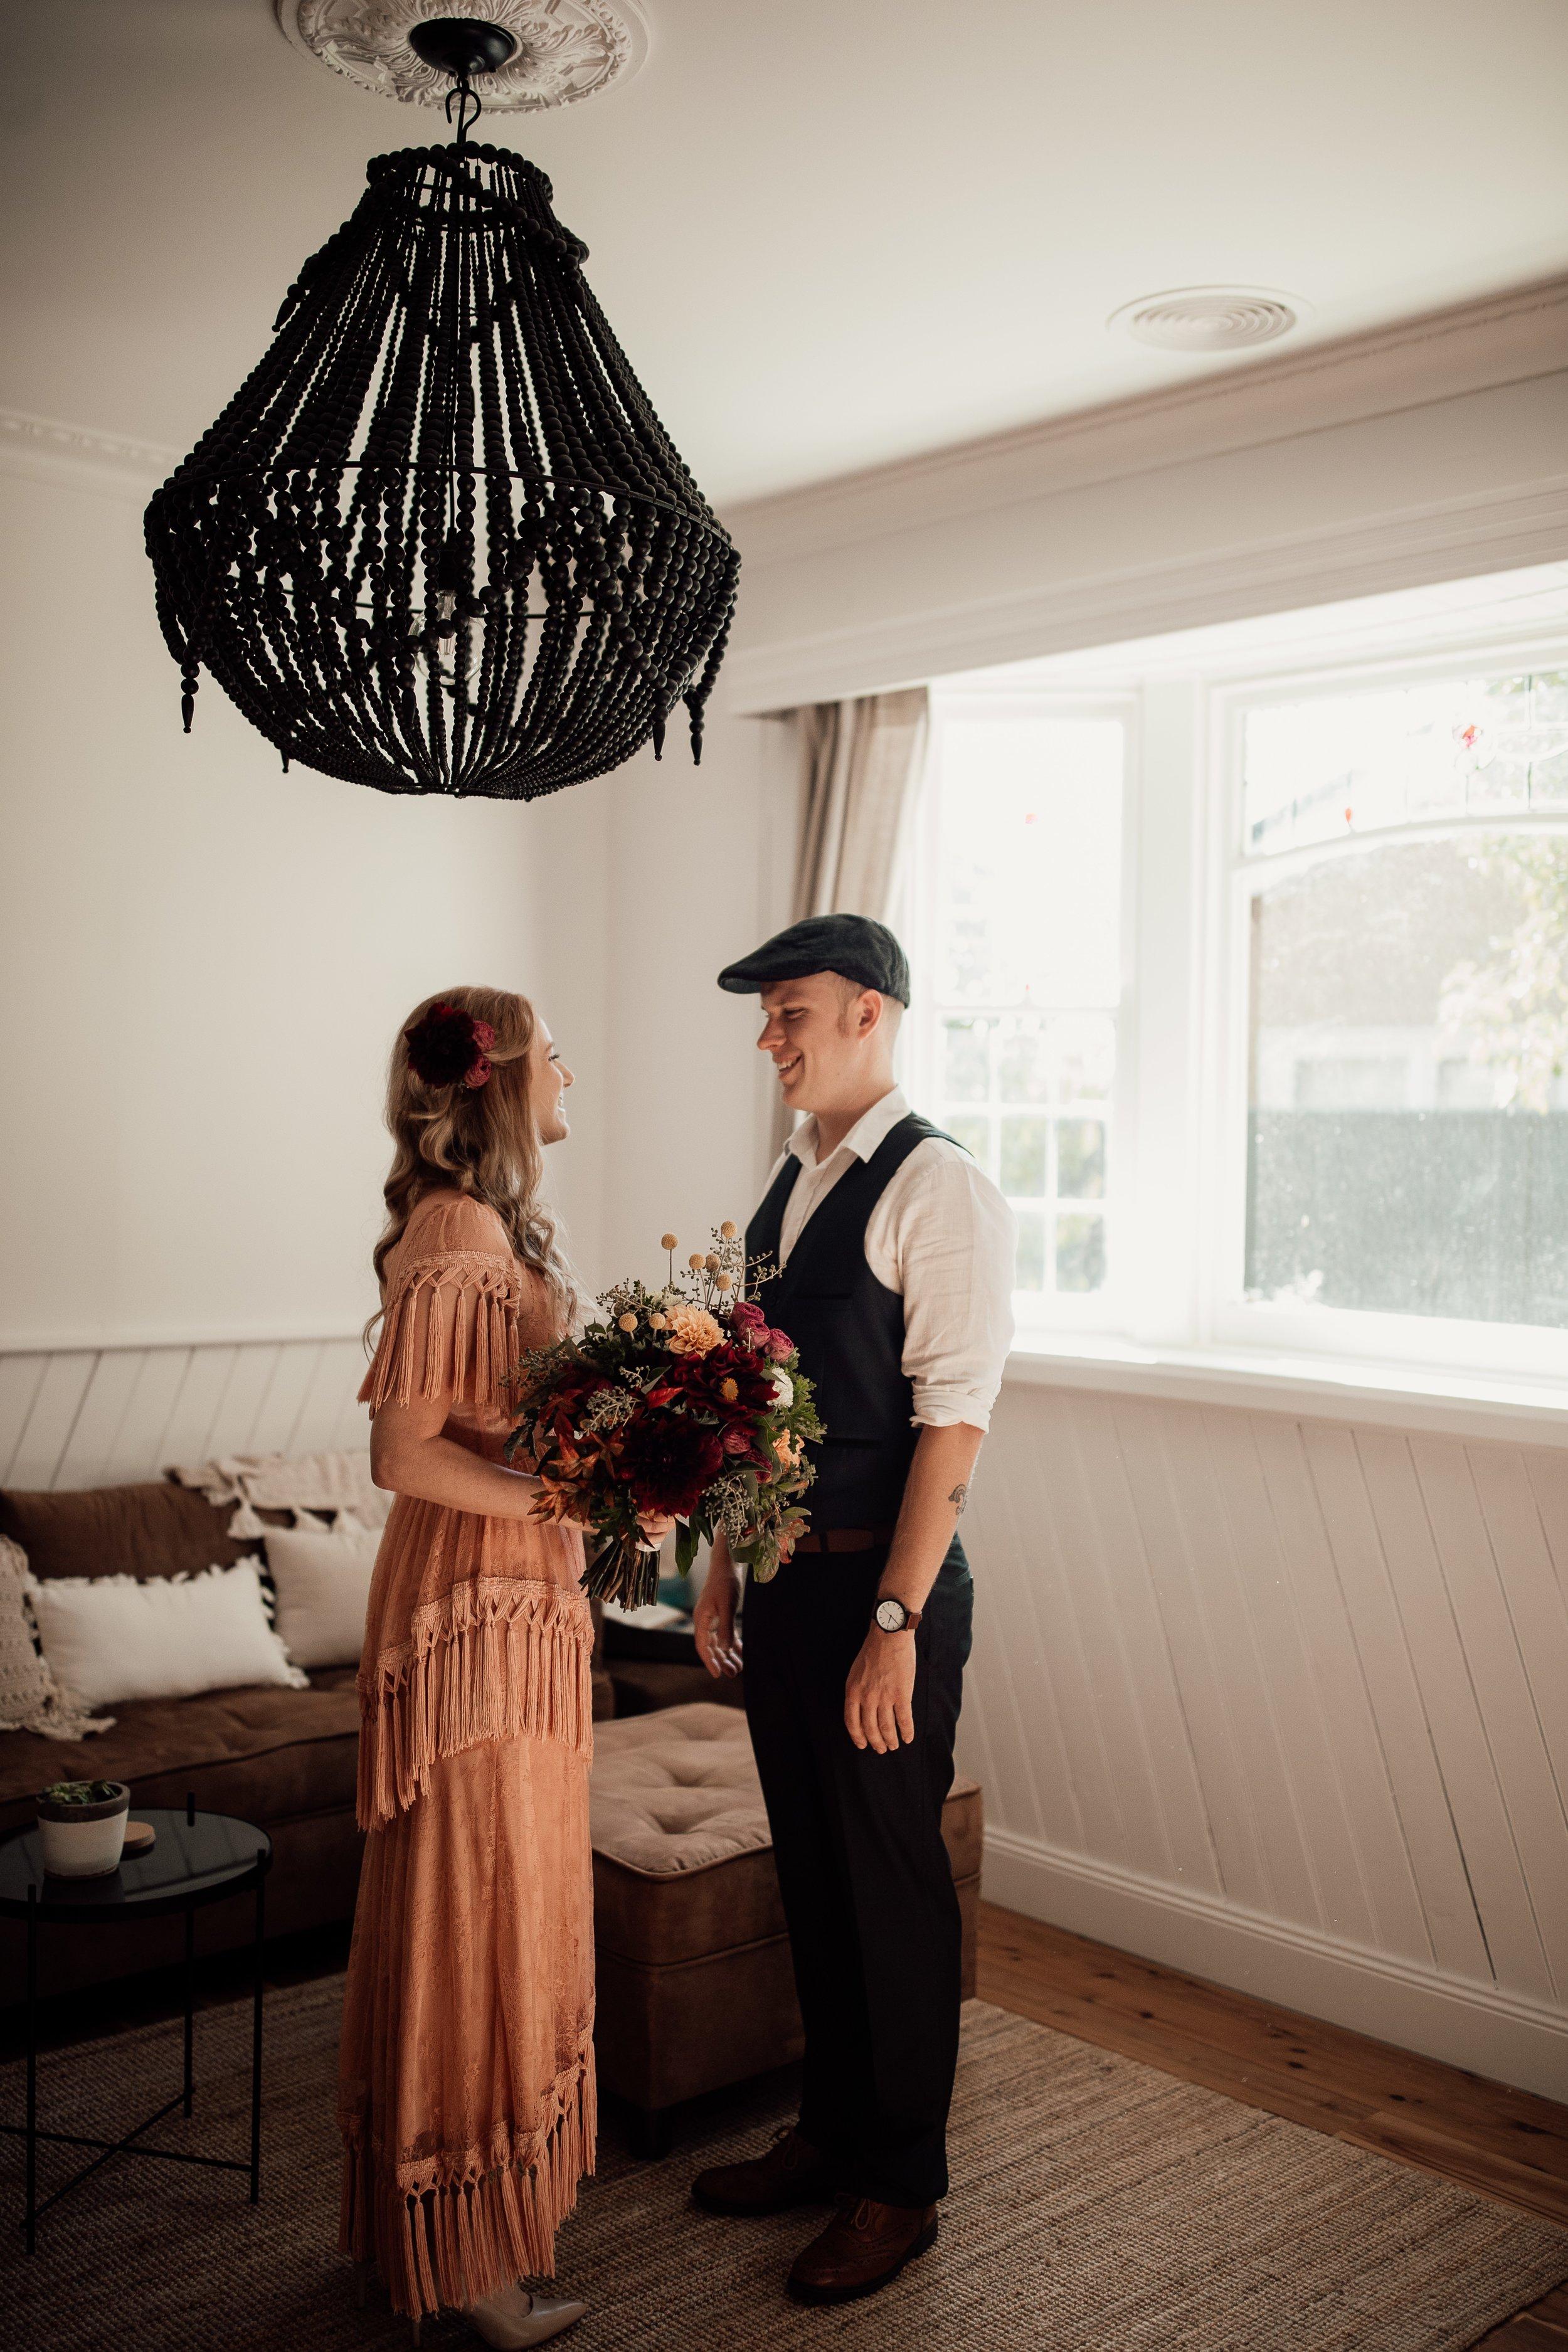 mickalathomas_puremacphotography_weddingphotographer_couplephotographer_Sheppartonphotographer_2107.jpg